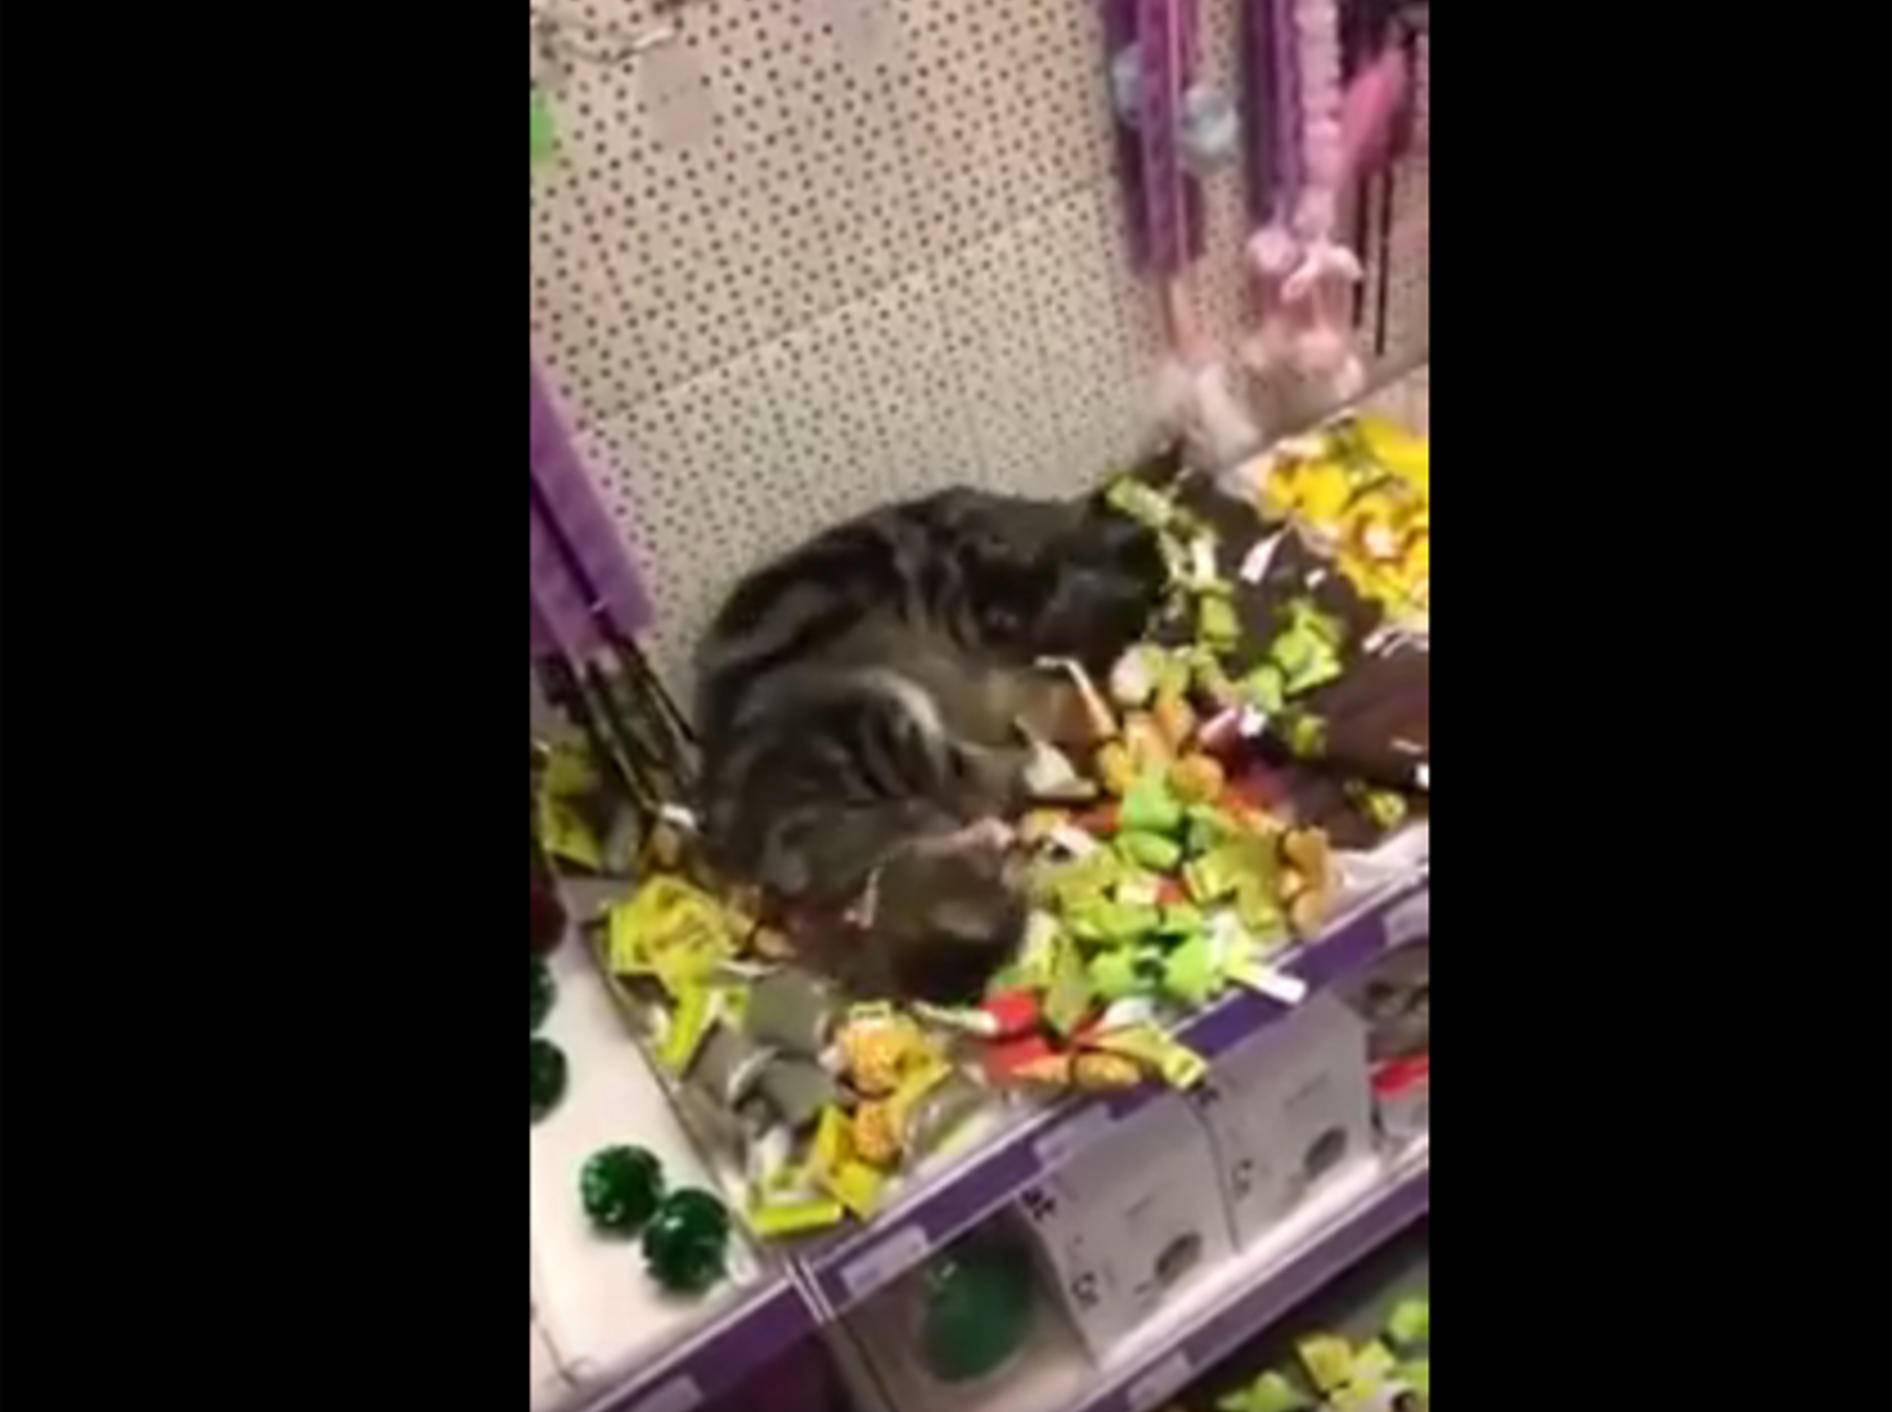 Ausgebuffte Katze klaut Katzenminze im Zoogeschäft – YouTube / SensualCat